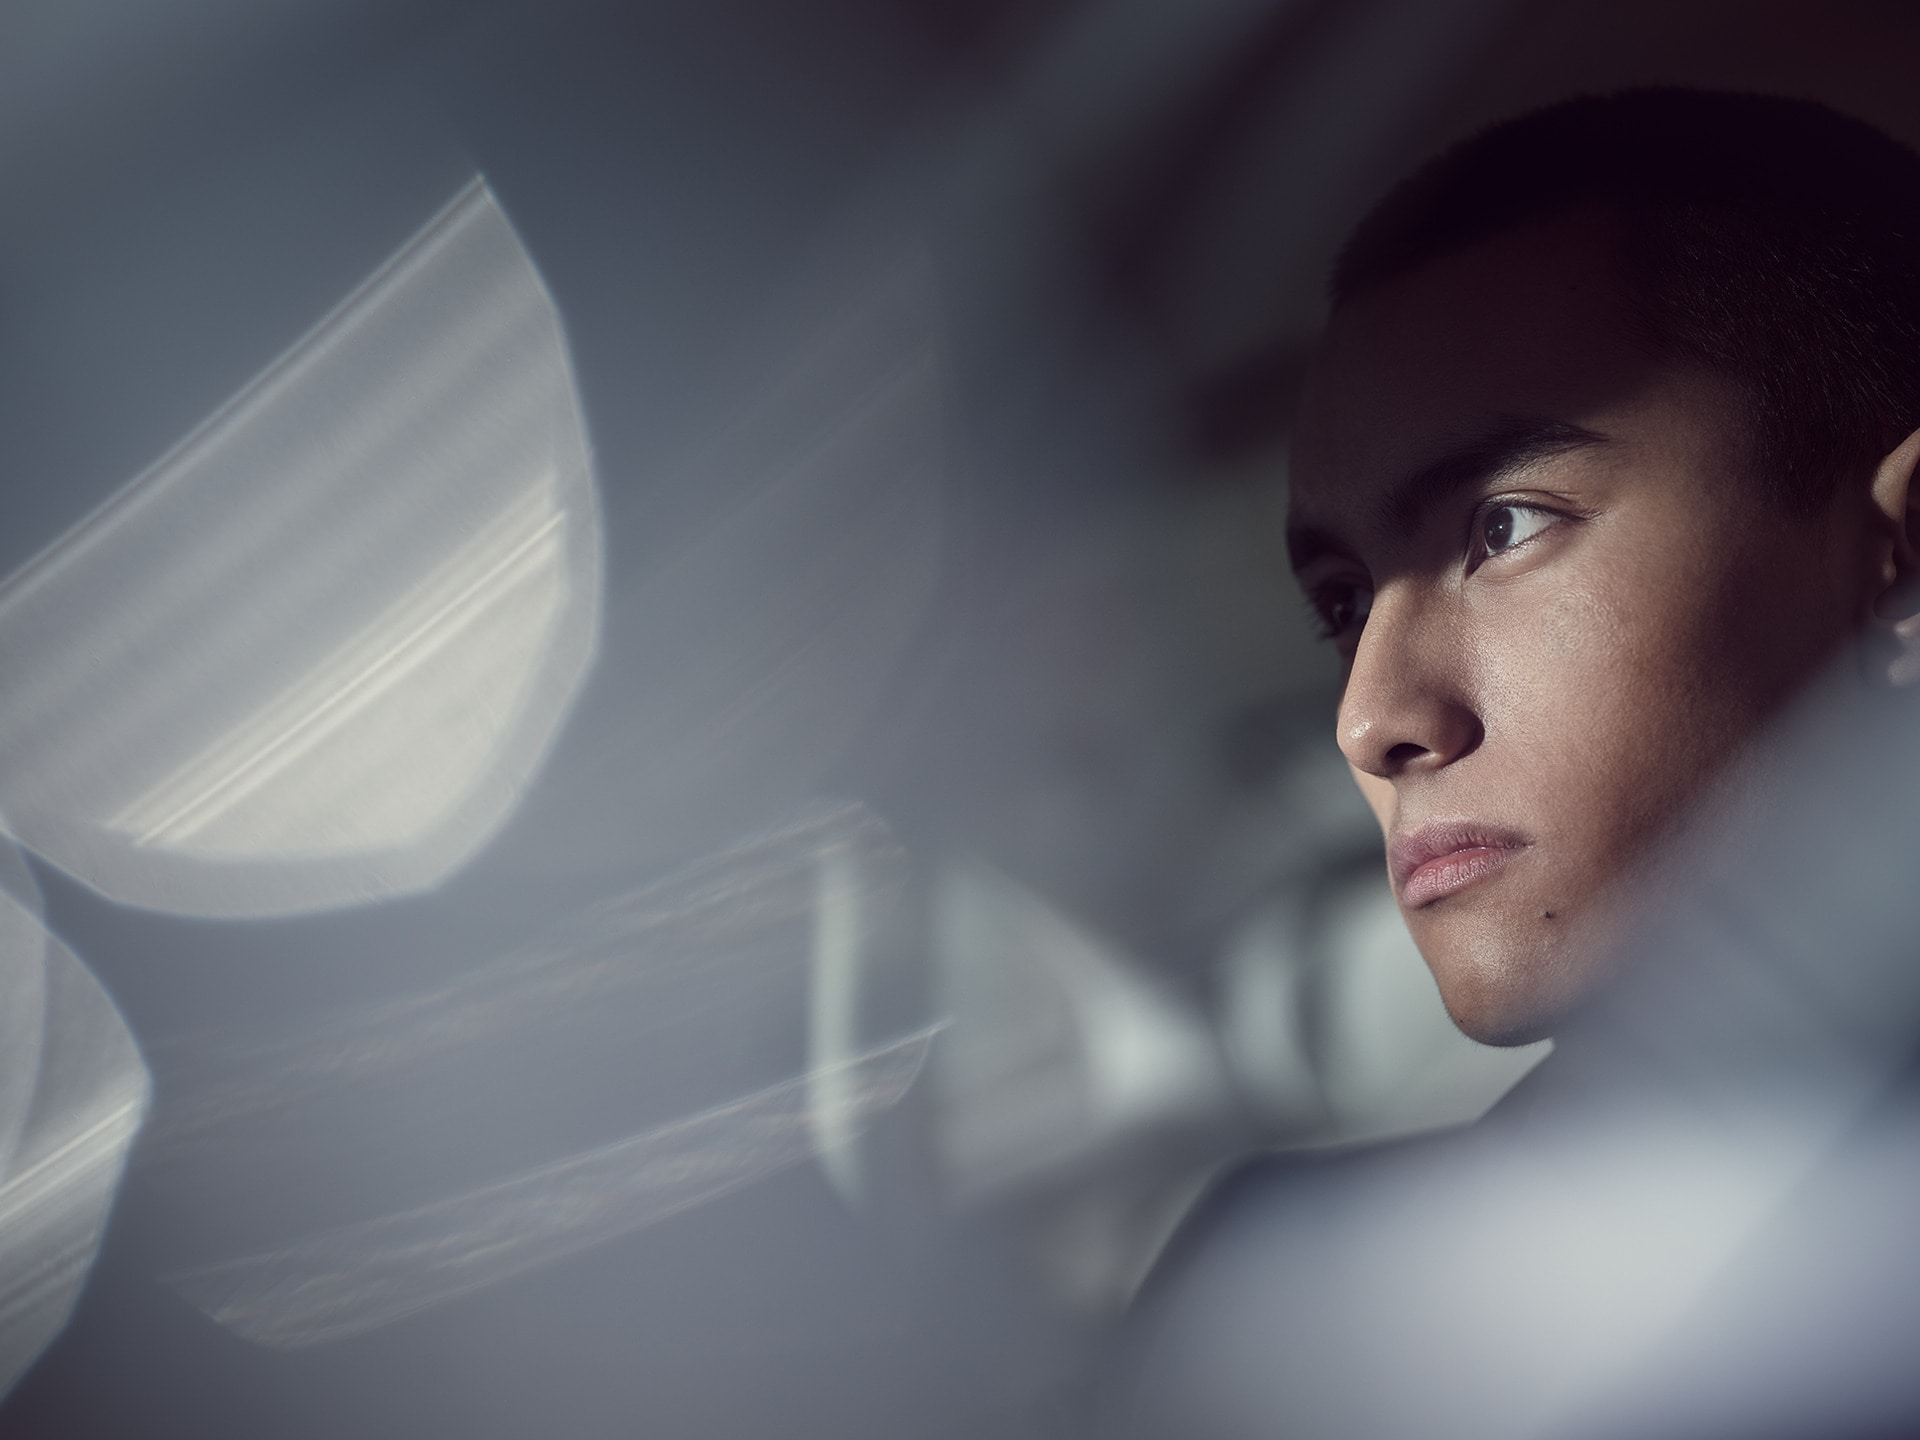 Слика одблиску од маж во задното седиште на Volvo S90 Recharge.